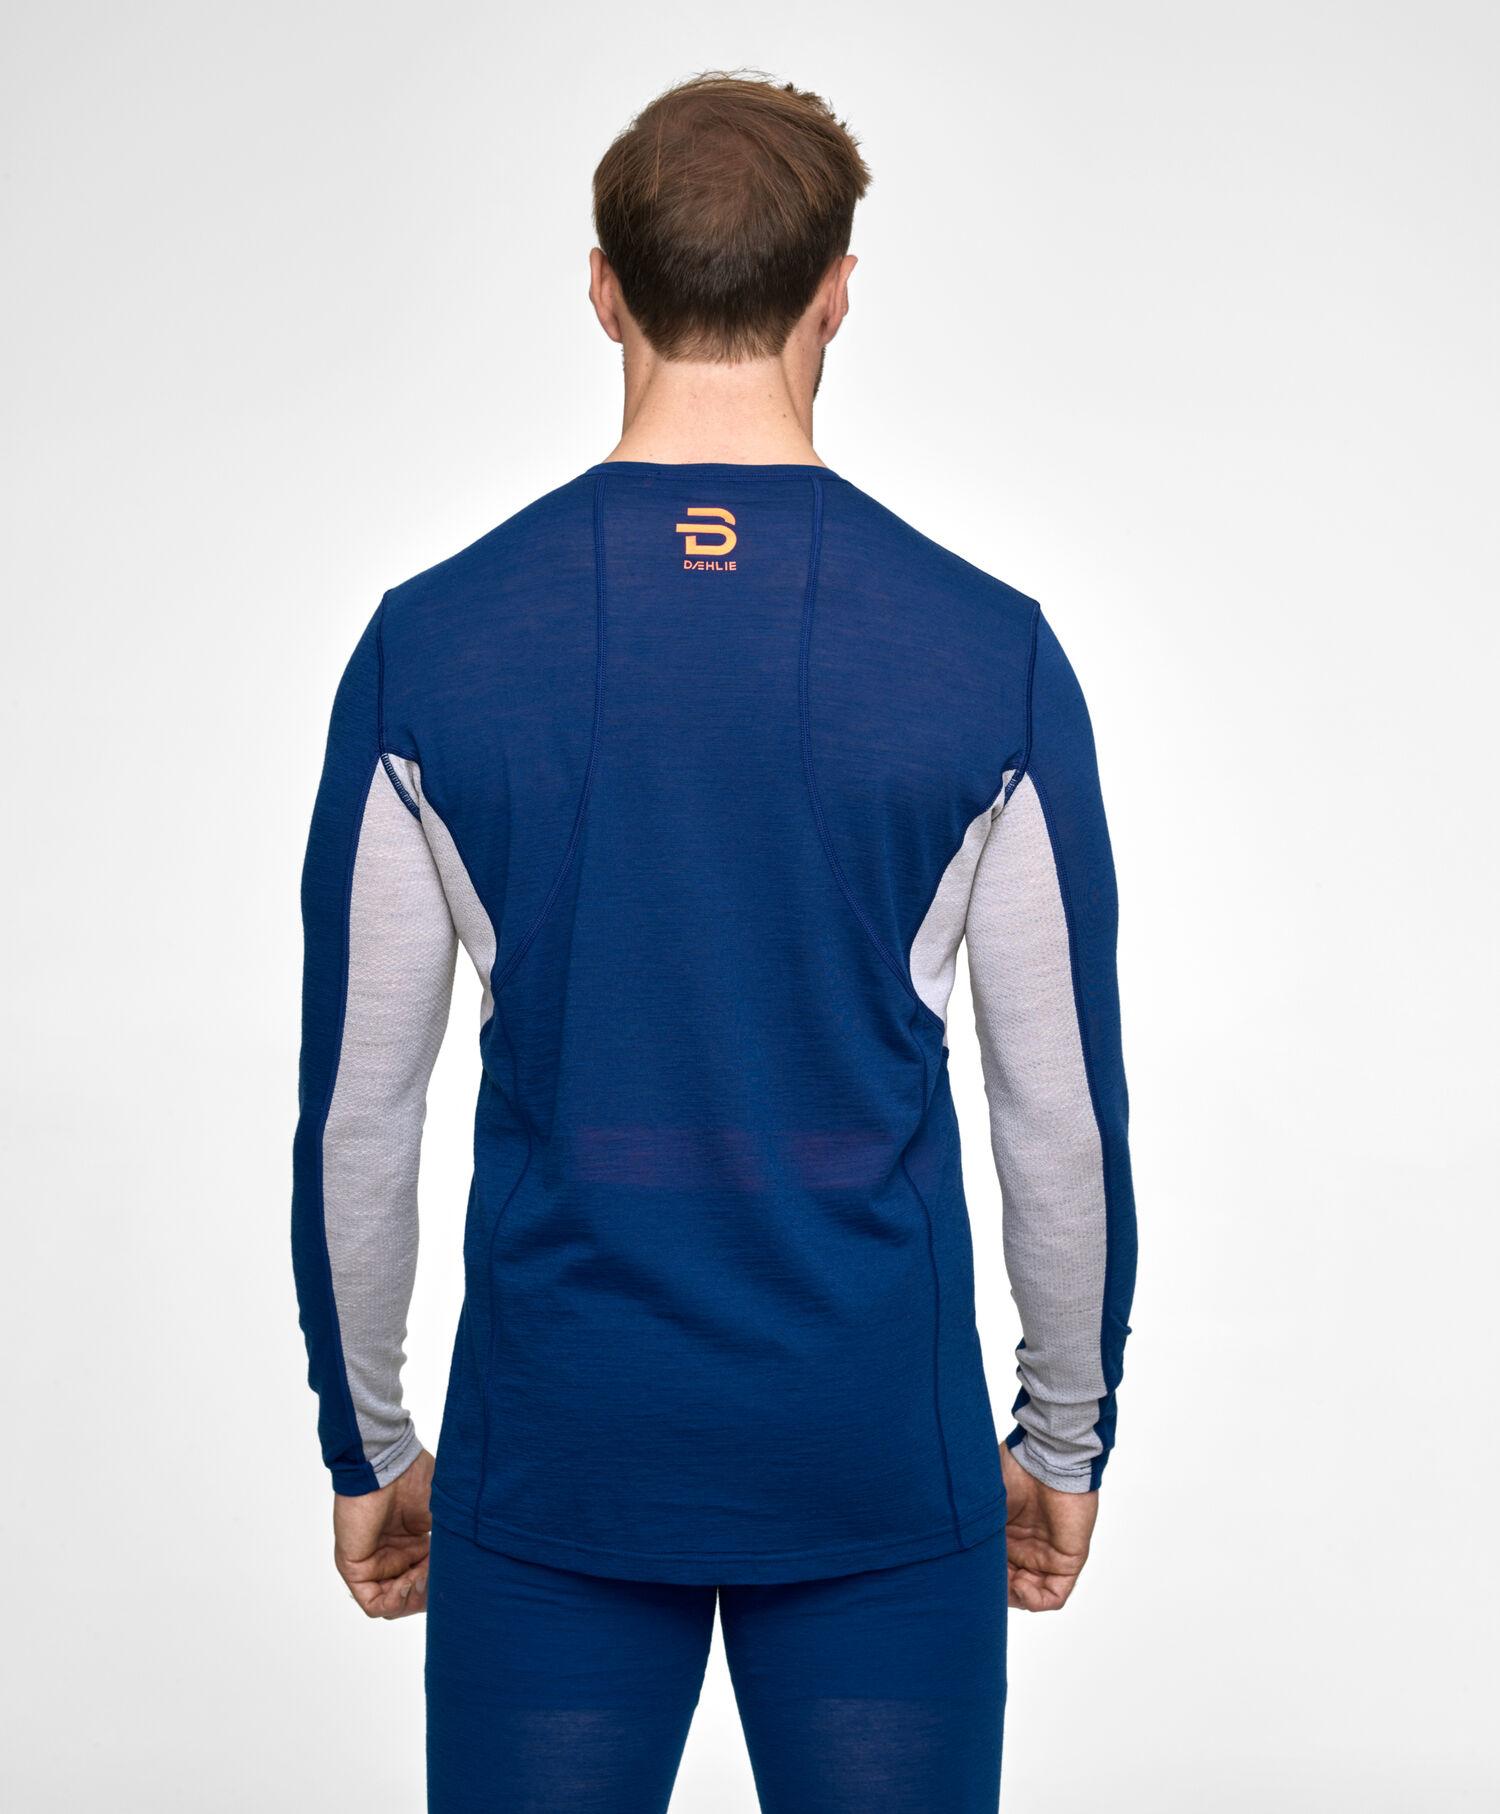 Bjørn Dæhlie Training Wool Long Sleeve